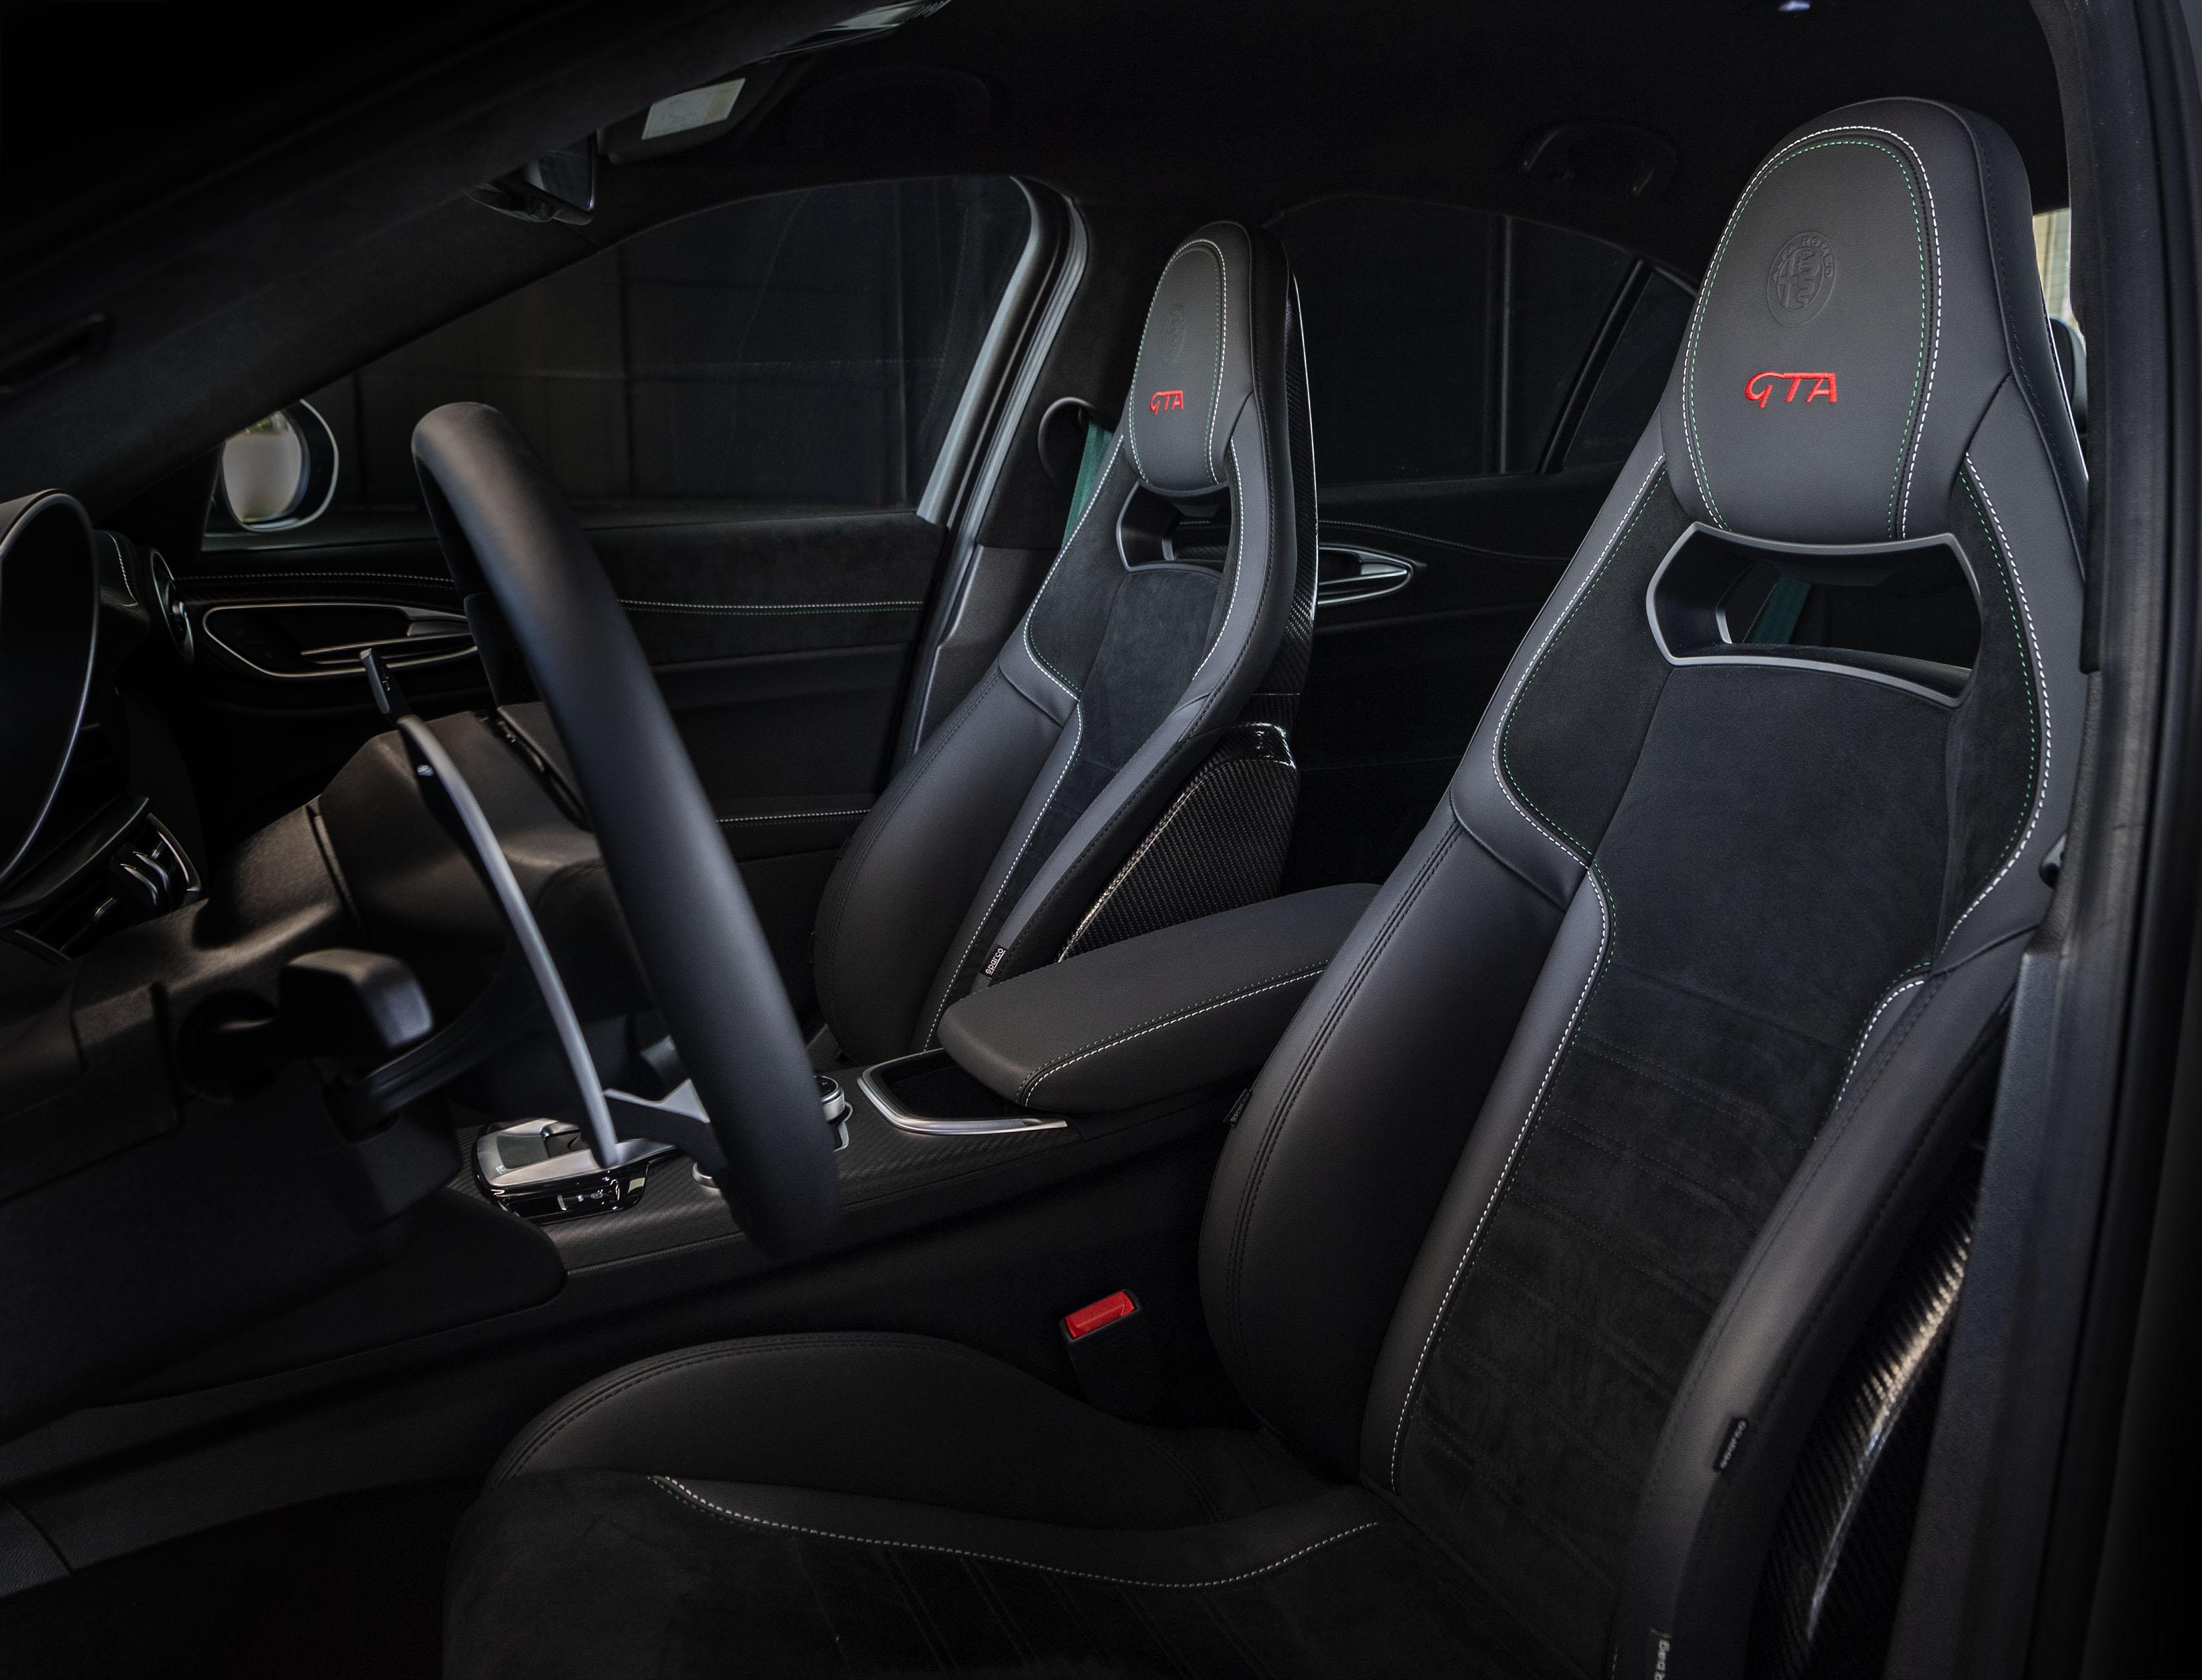 Sold out η καινούρια Alfa Romeo GTA